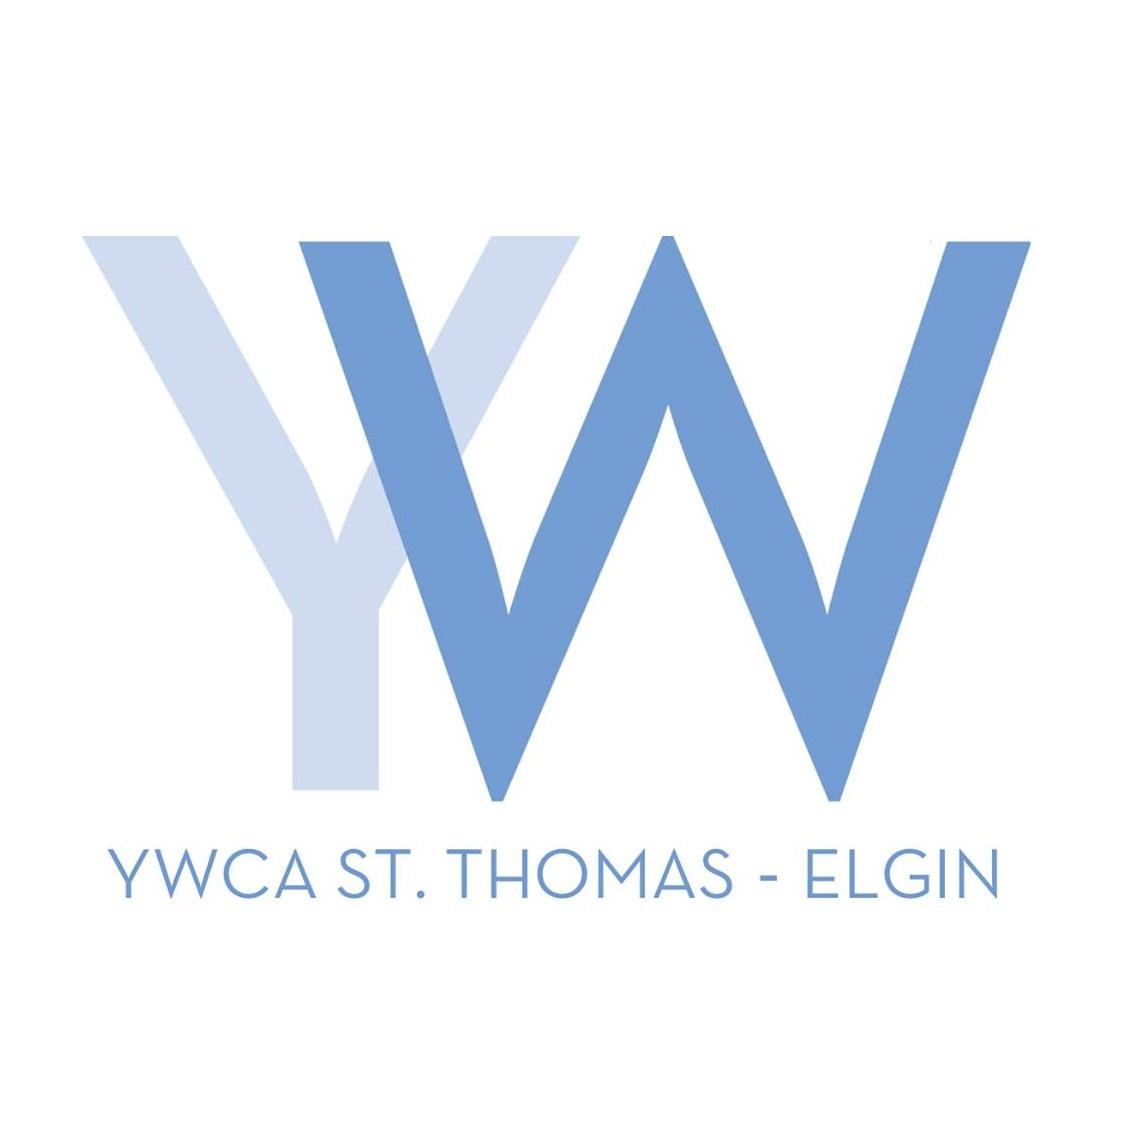 YWCA St.Thomas-Elgin